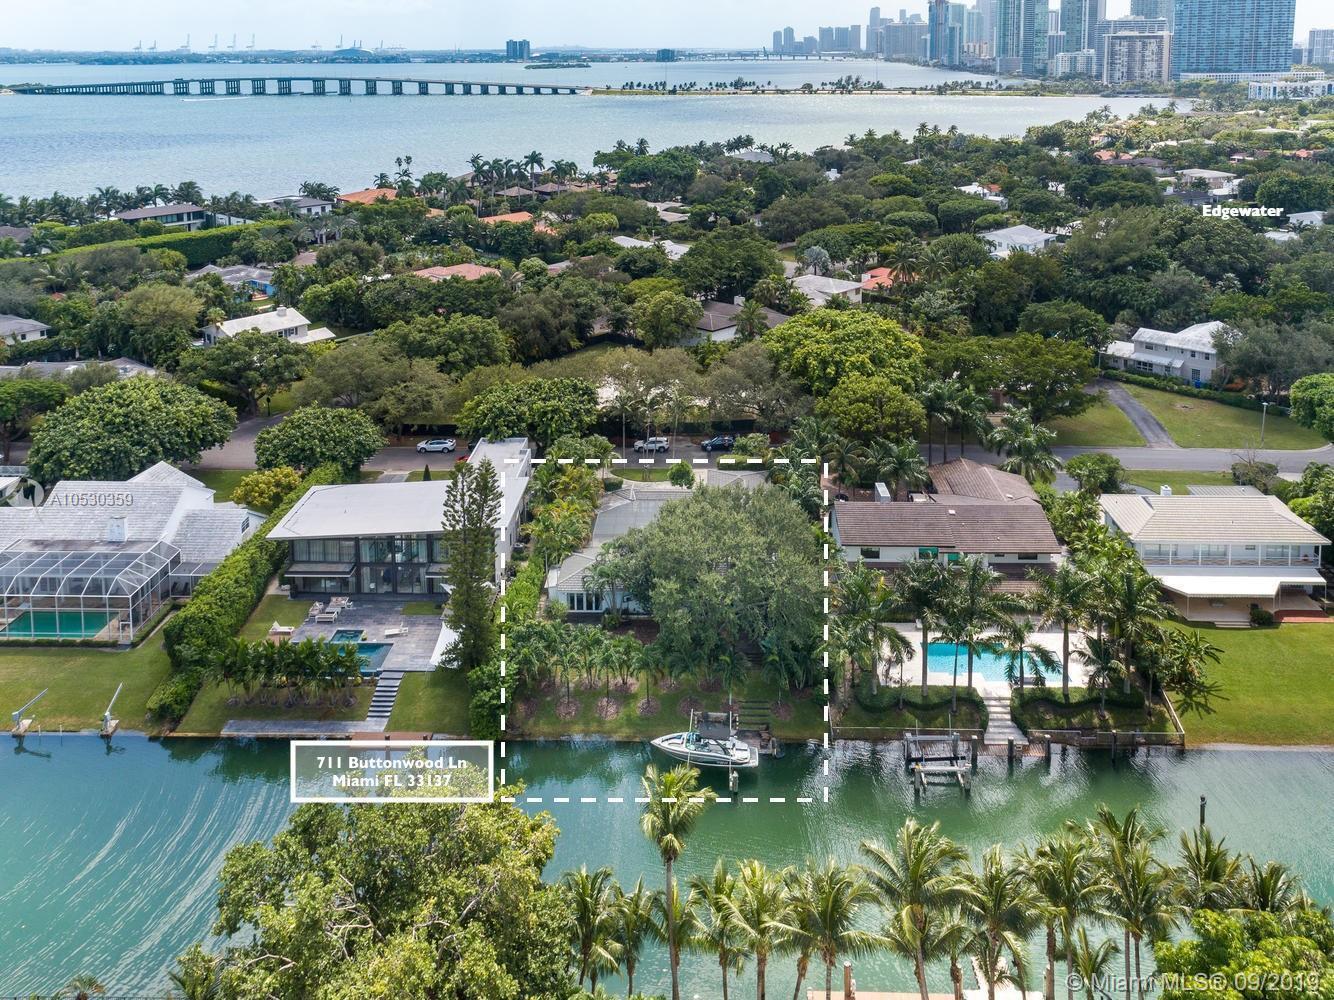 711 Buttonwood Ln, Miami, FL, 33137